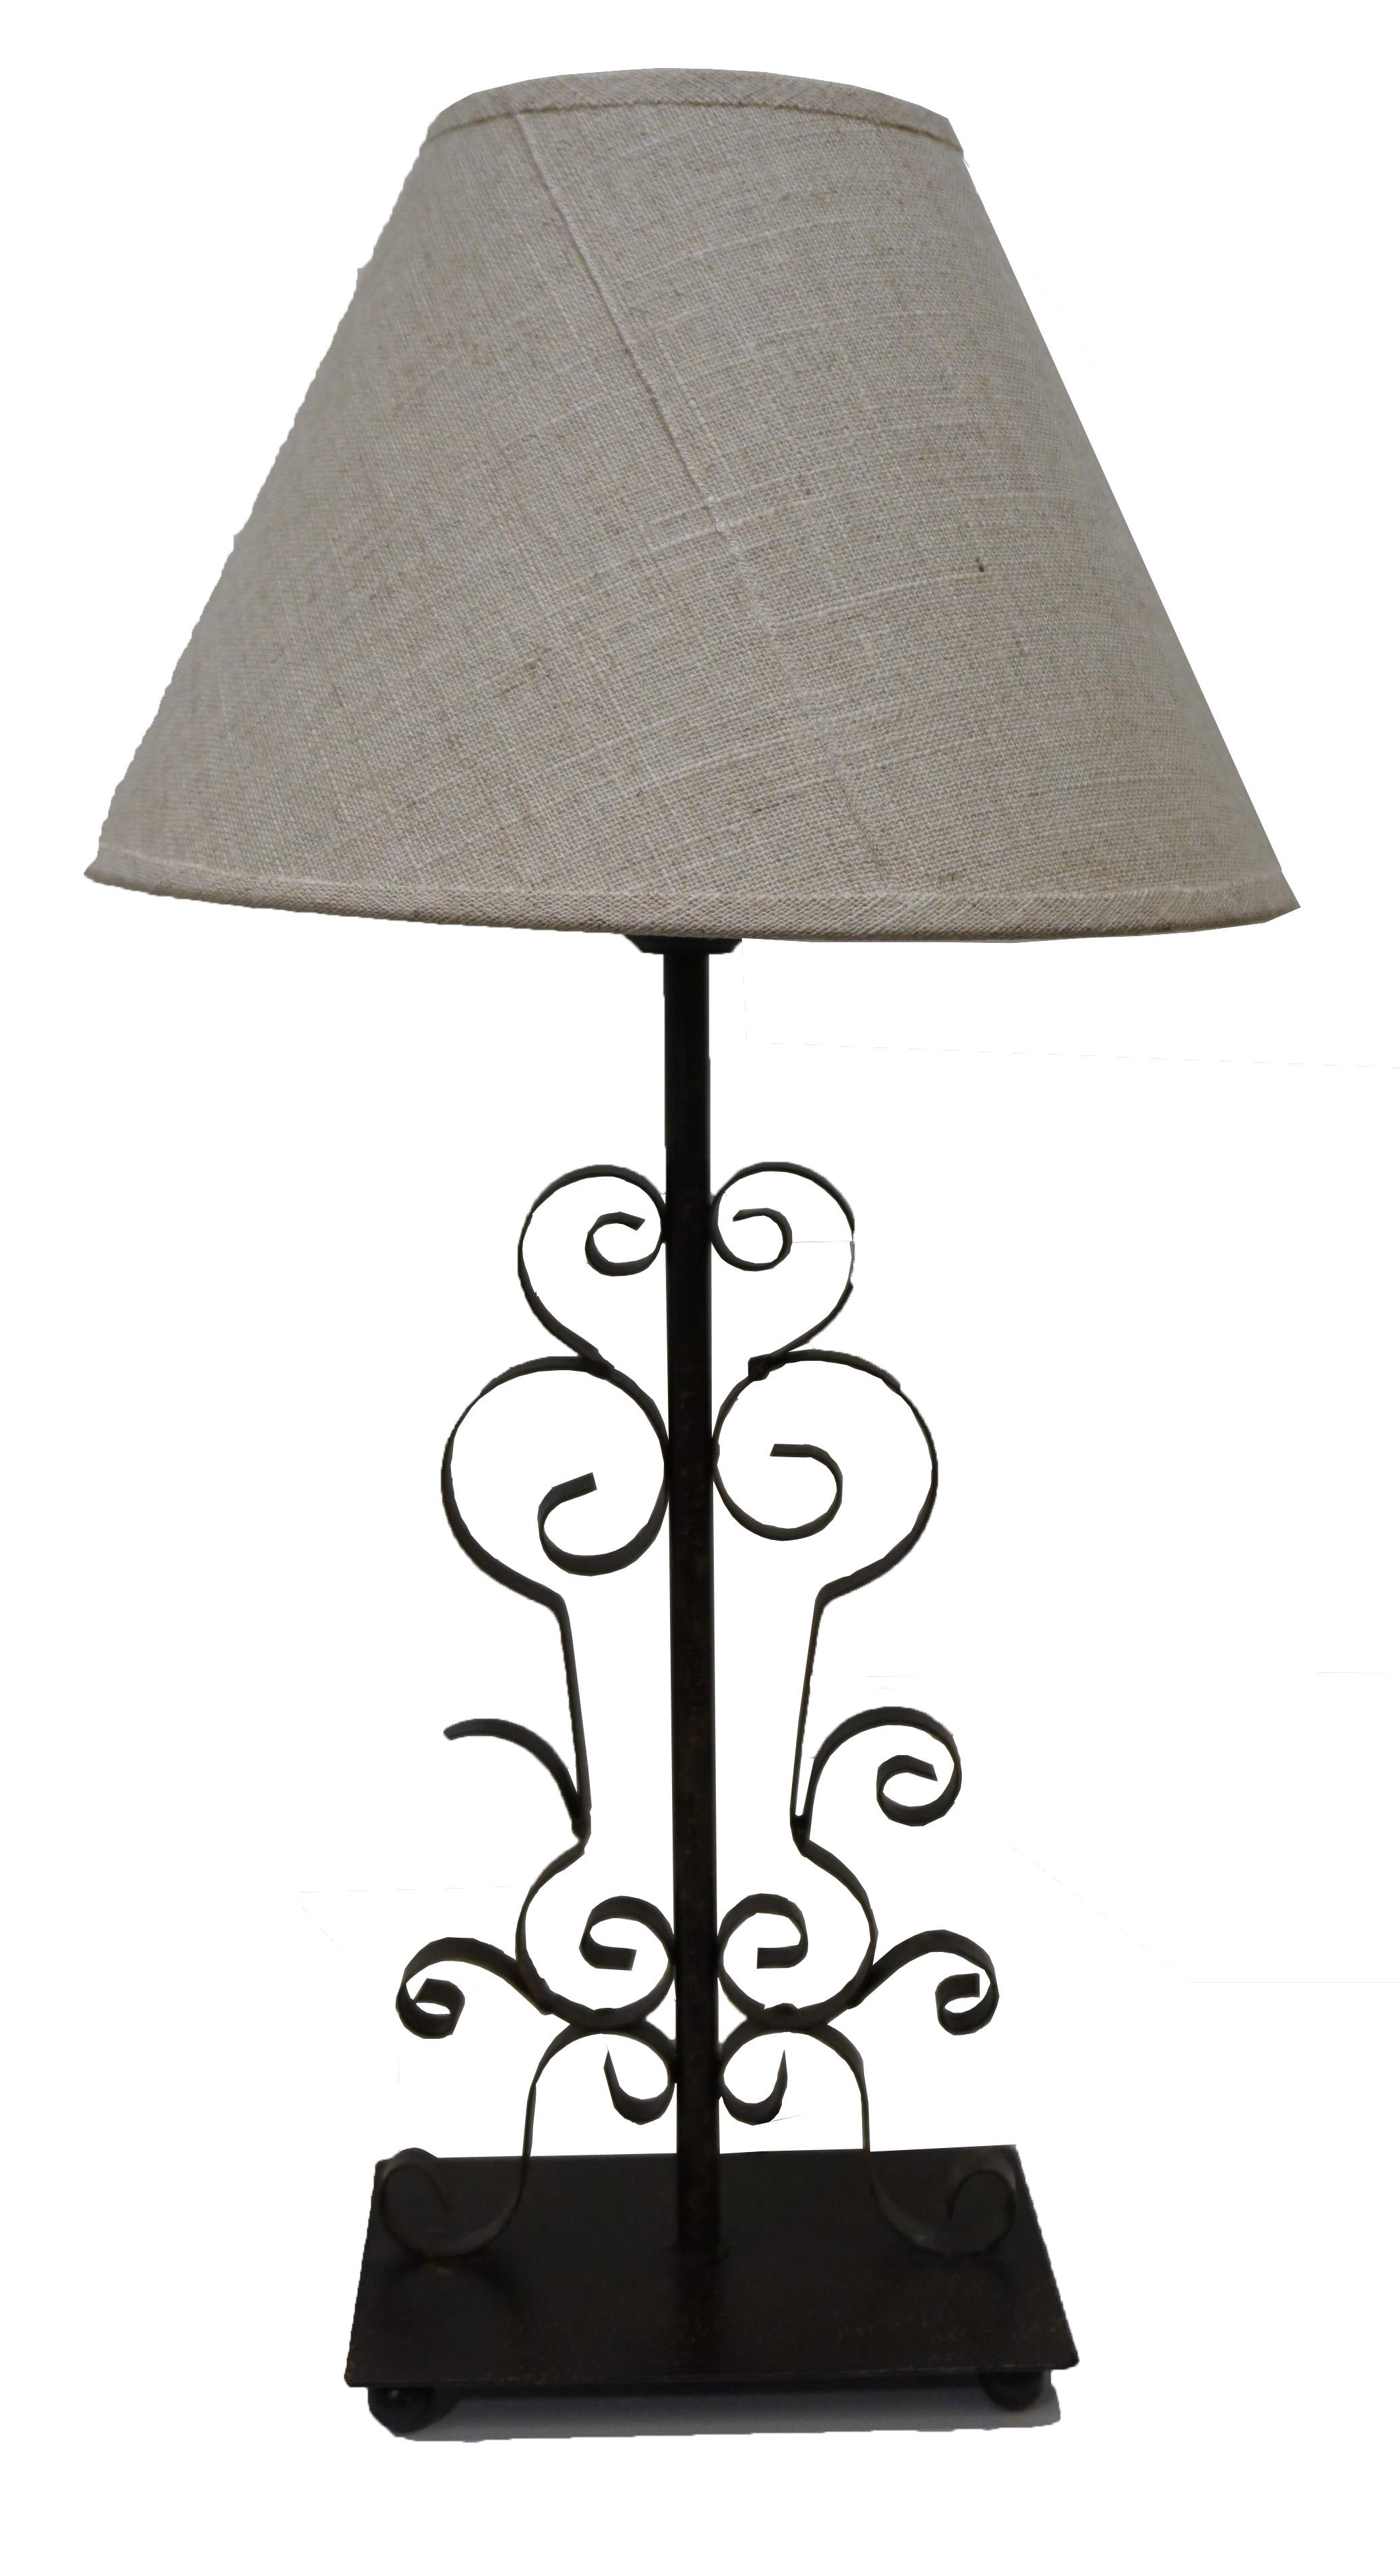 Tischlampe Varanti